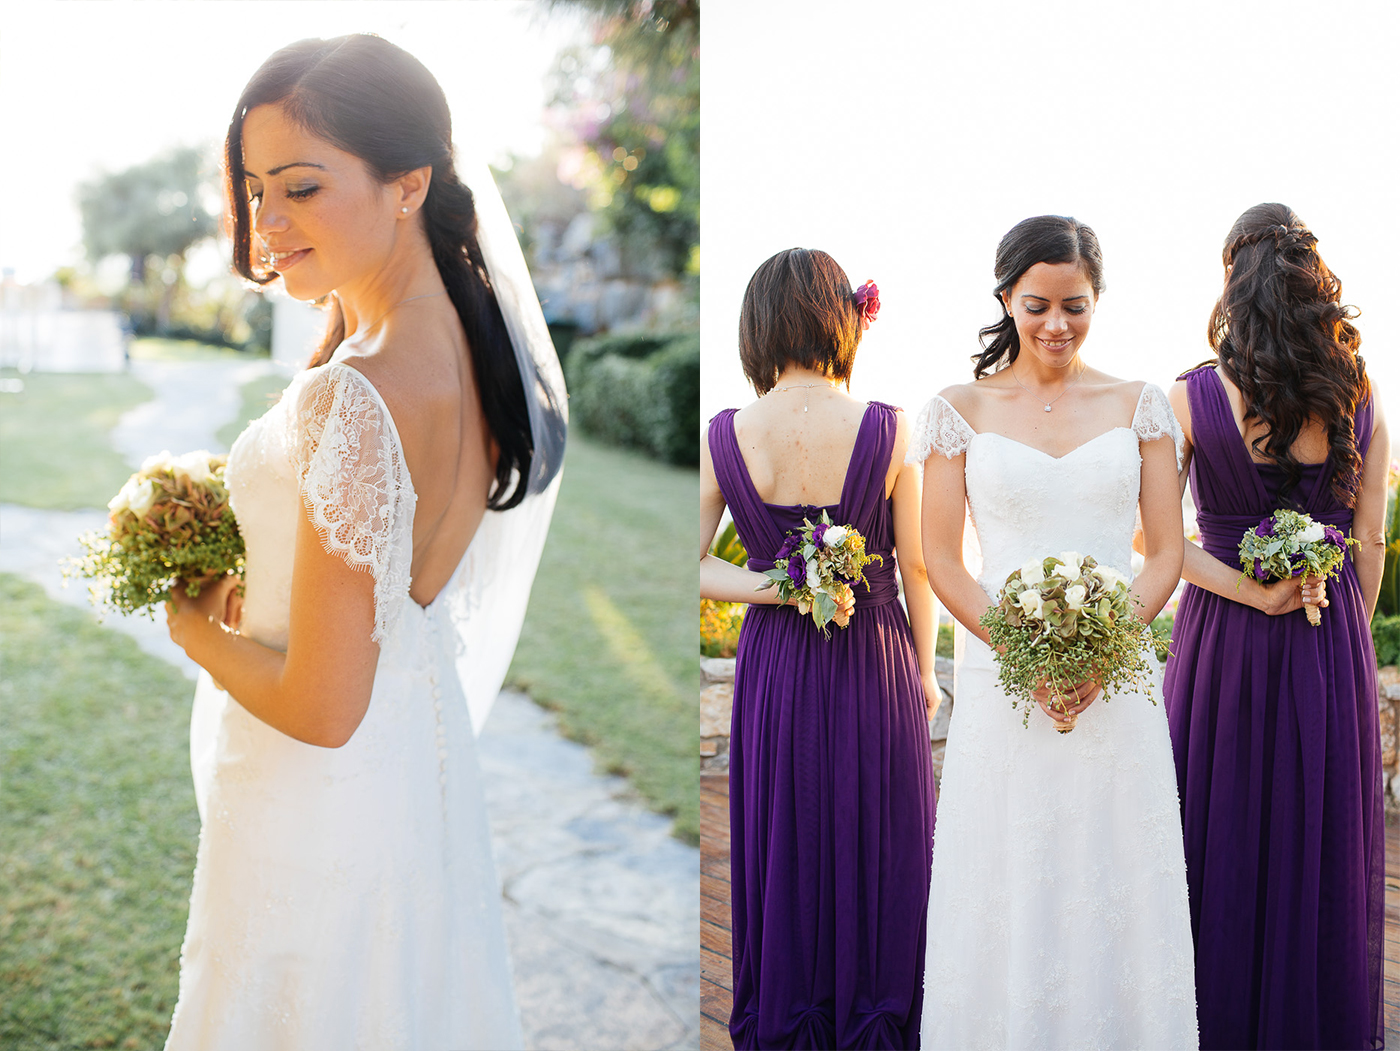 Bodrum-Weddings-Raphael-Perim-17